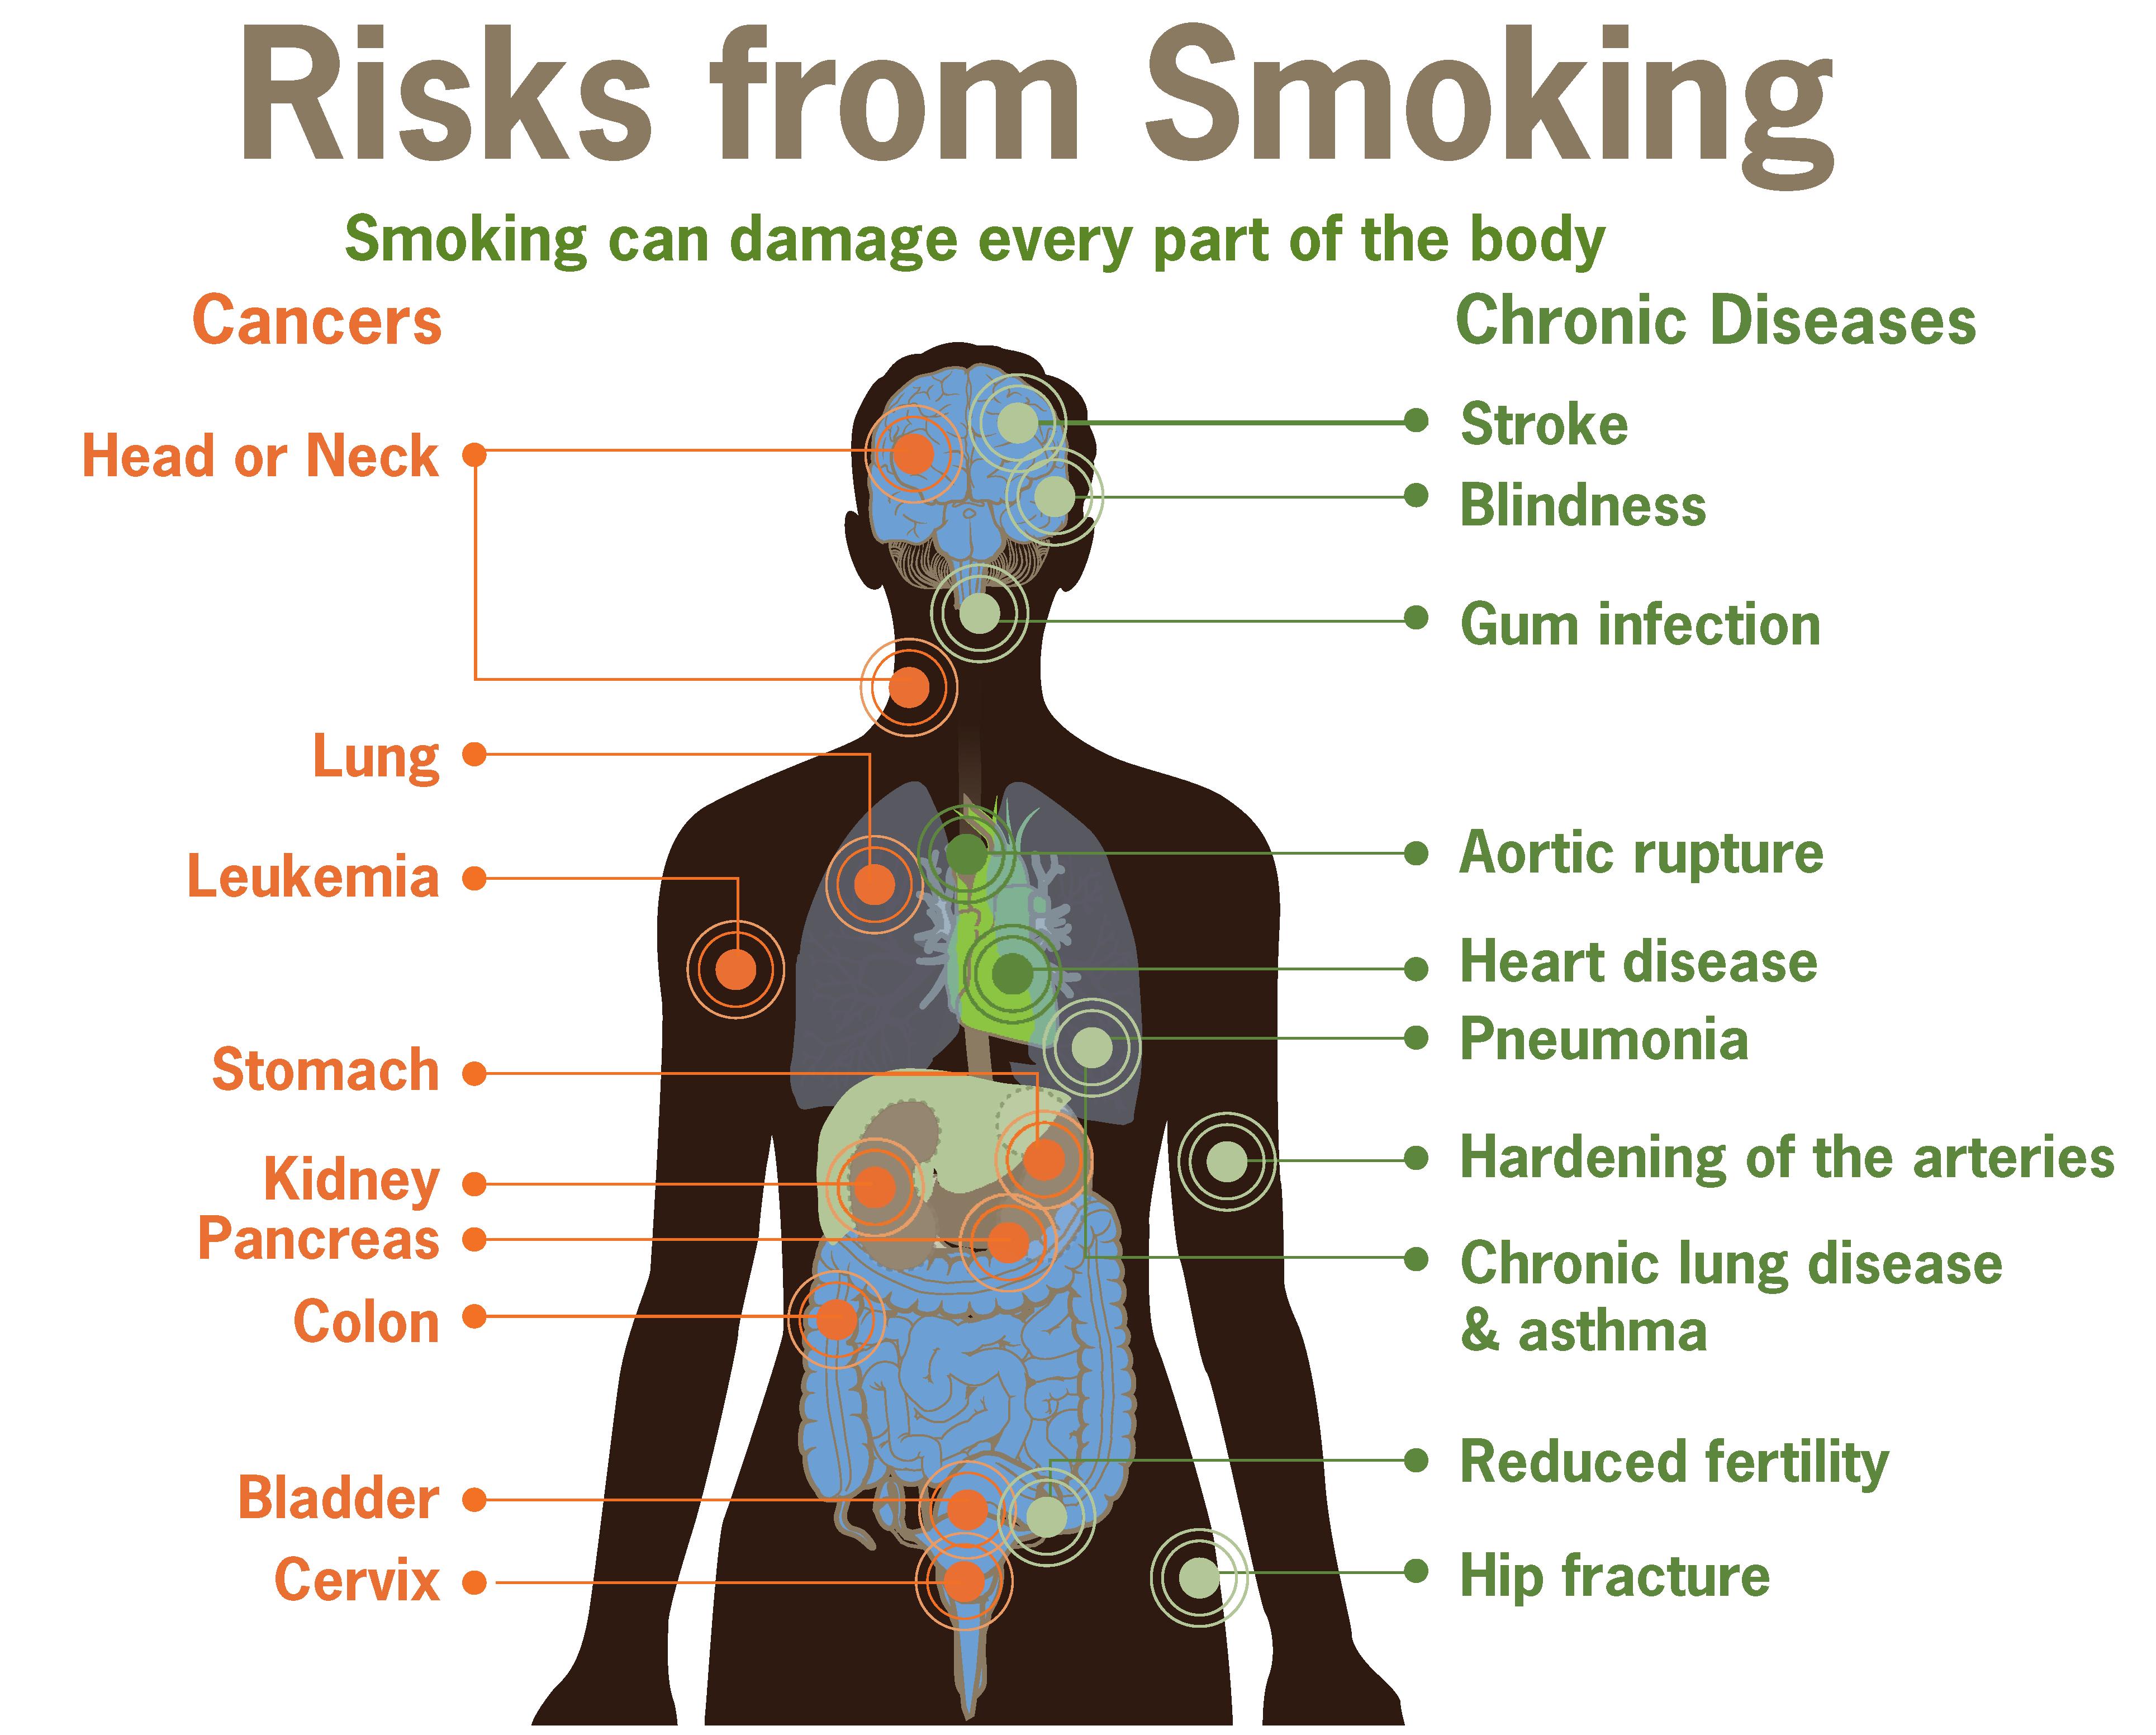 Risk Of Smoking